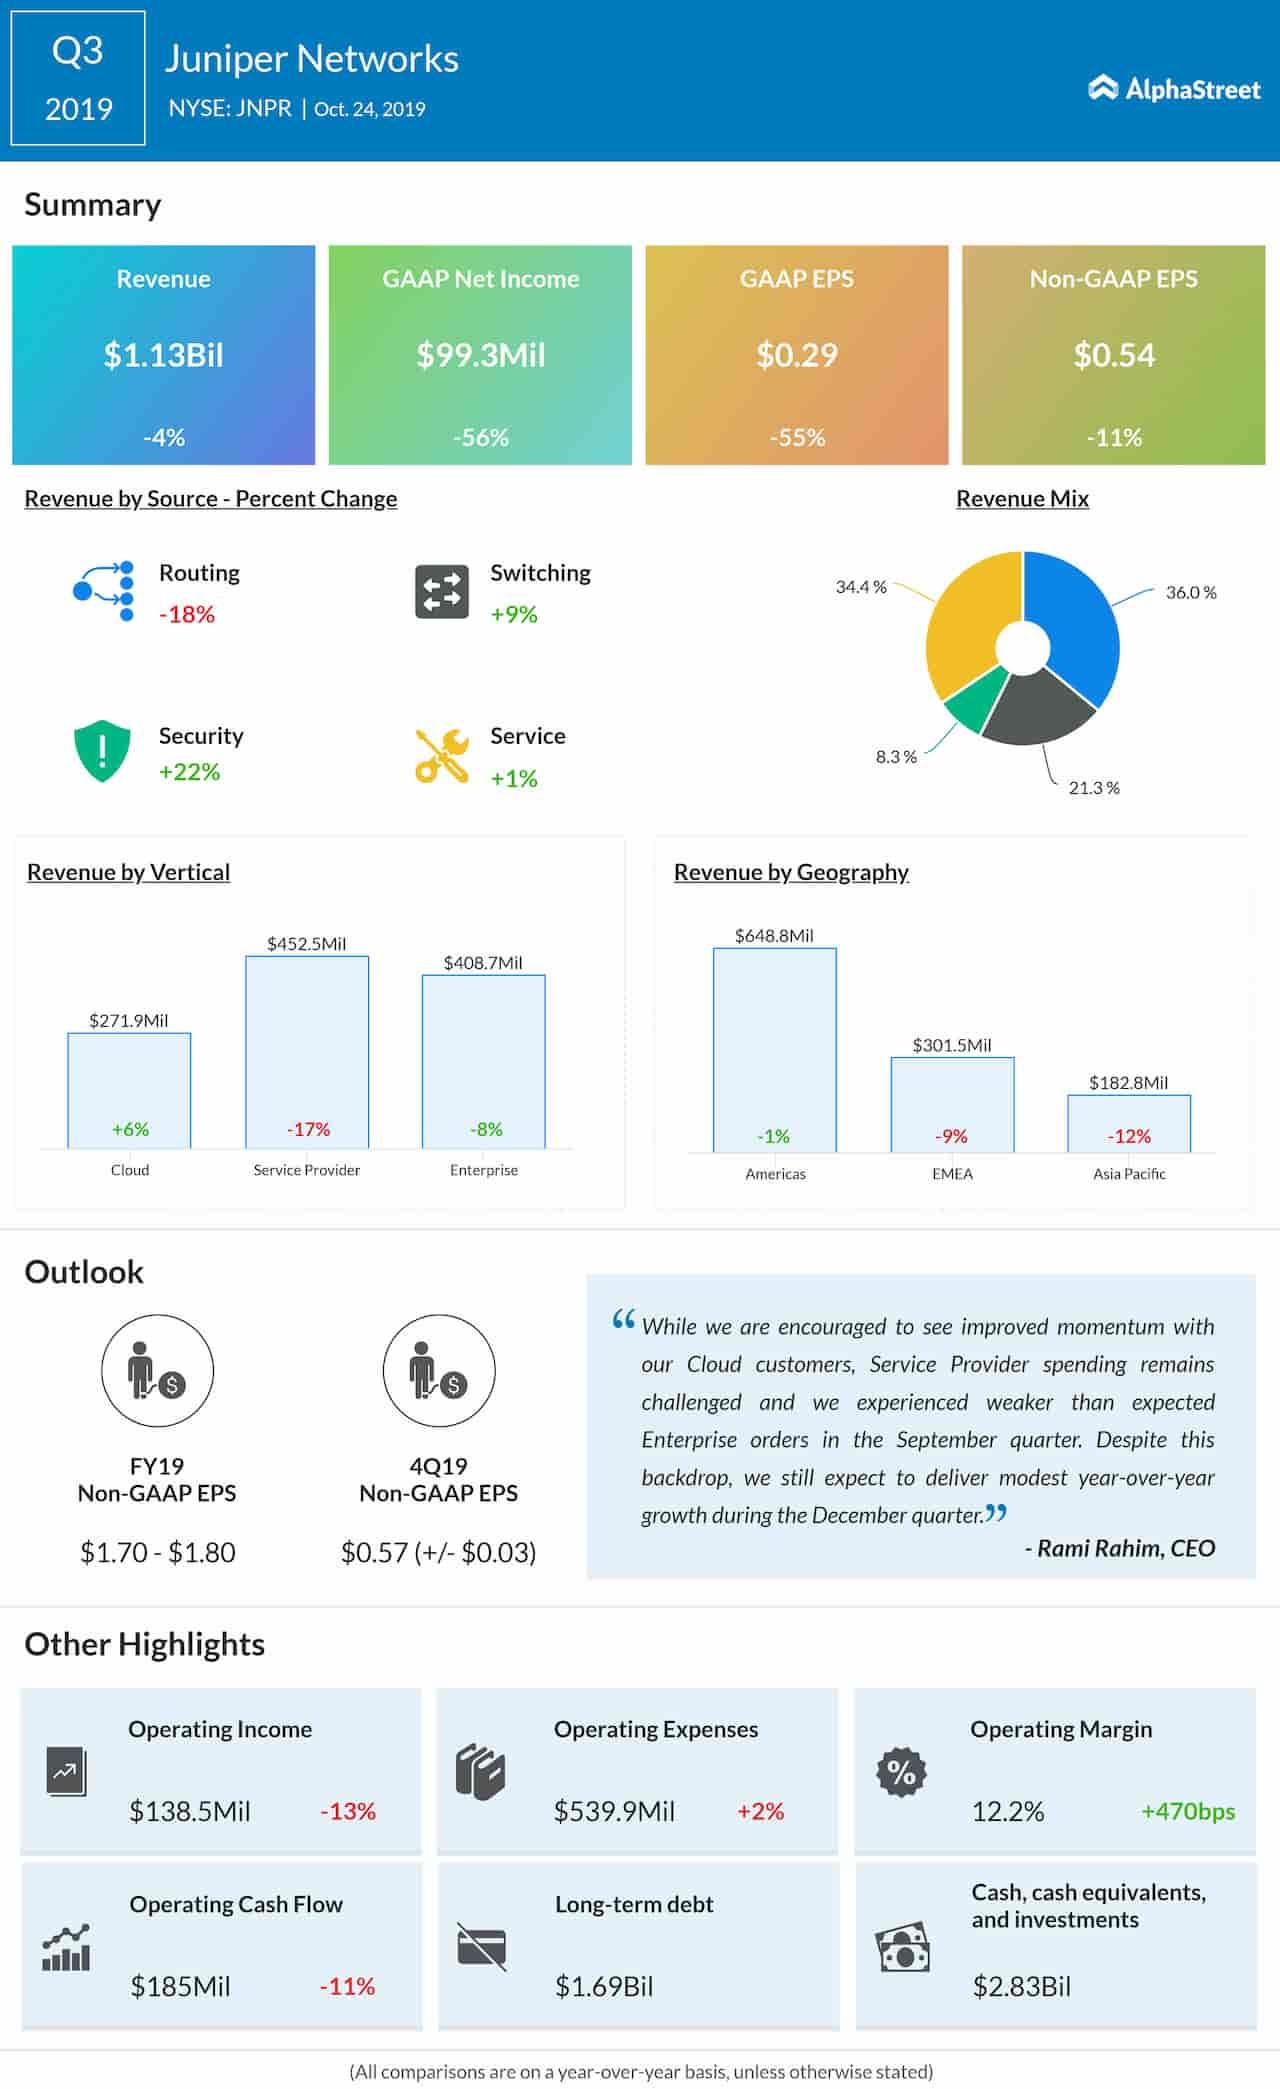 Juniper Networks (NYSE: JNPR): Q3 2019 Earnings Snapshot